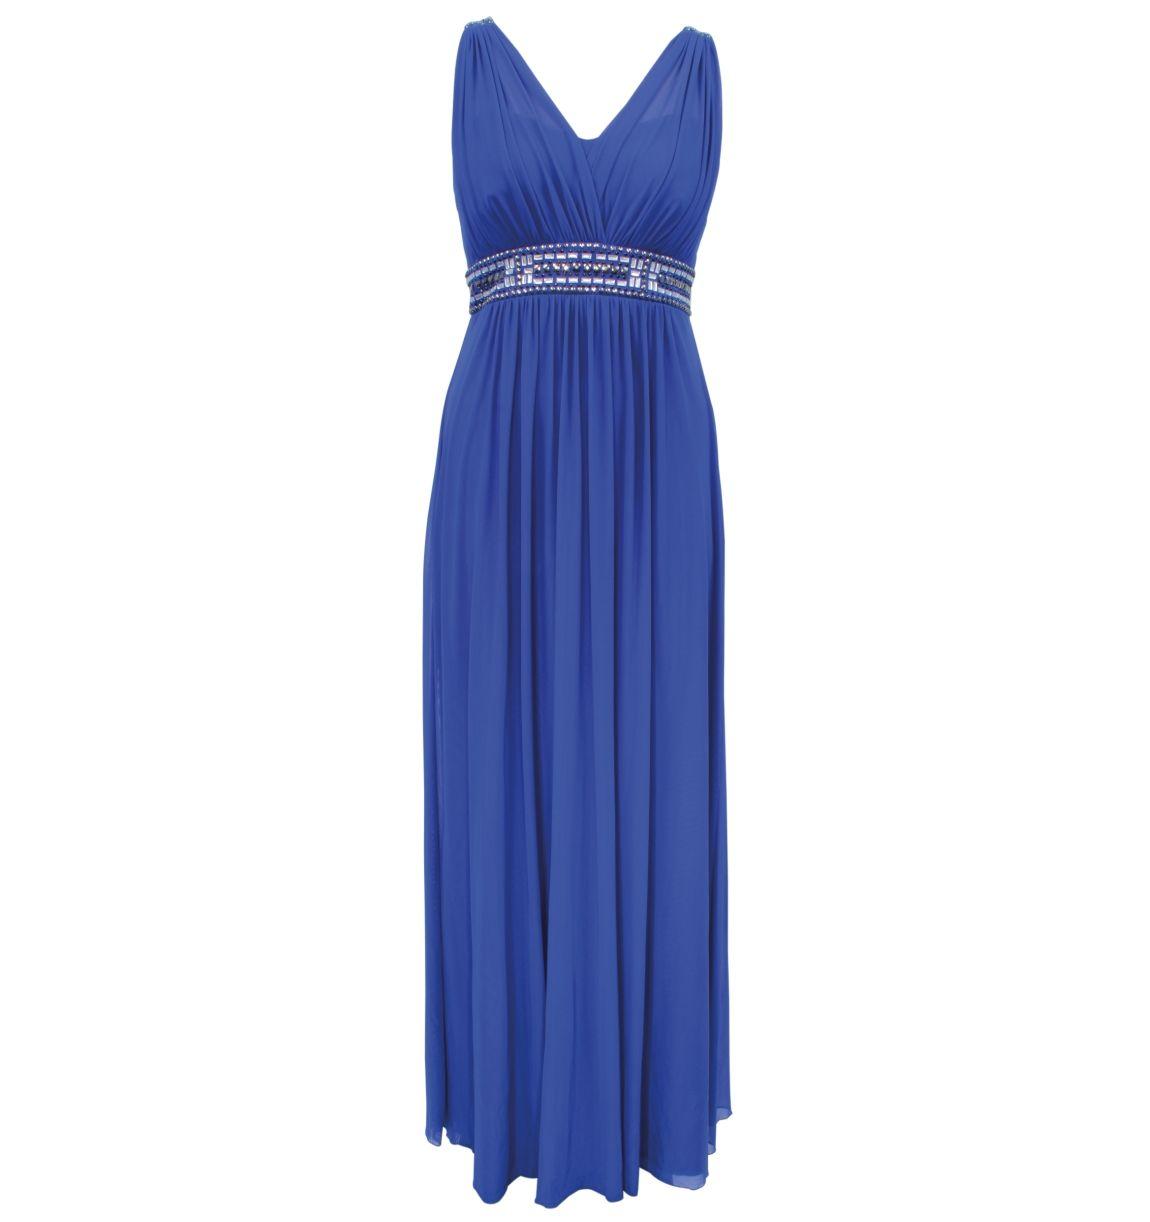 Foschini Clothing Formal Dresses